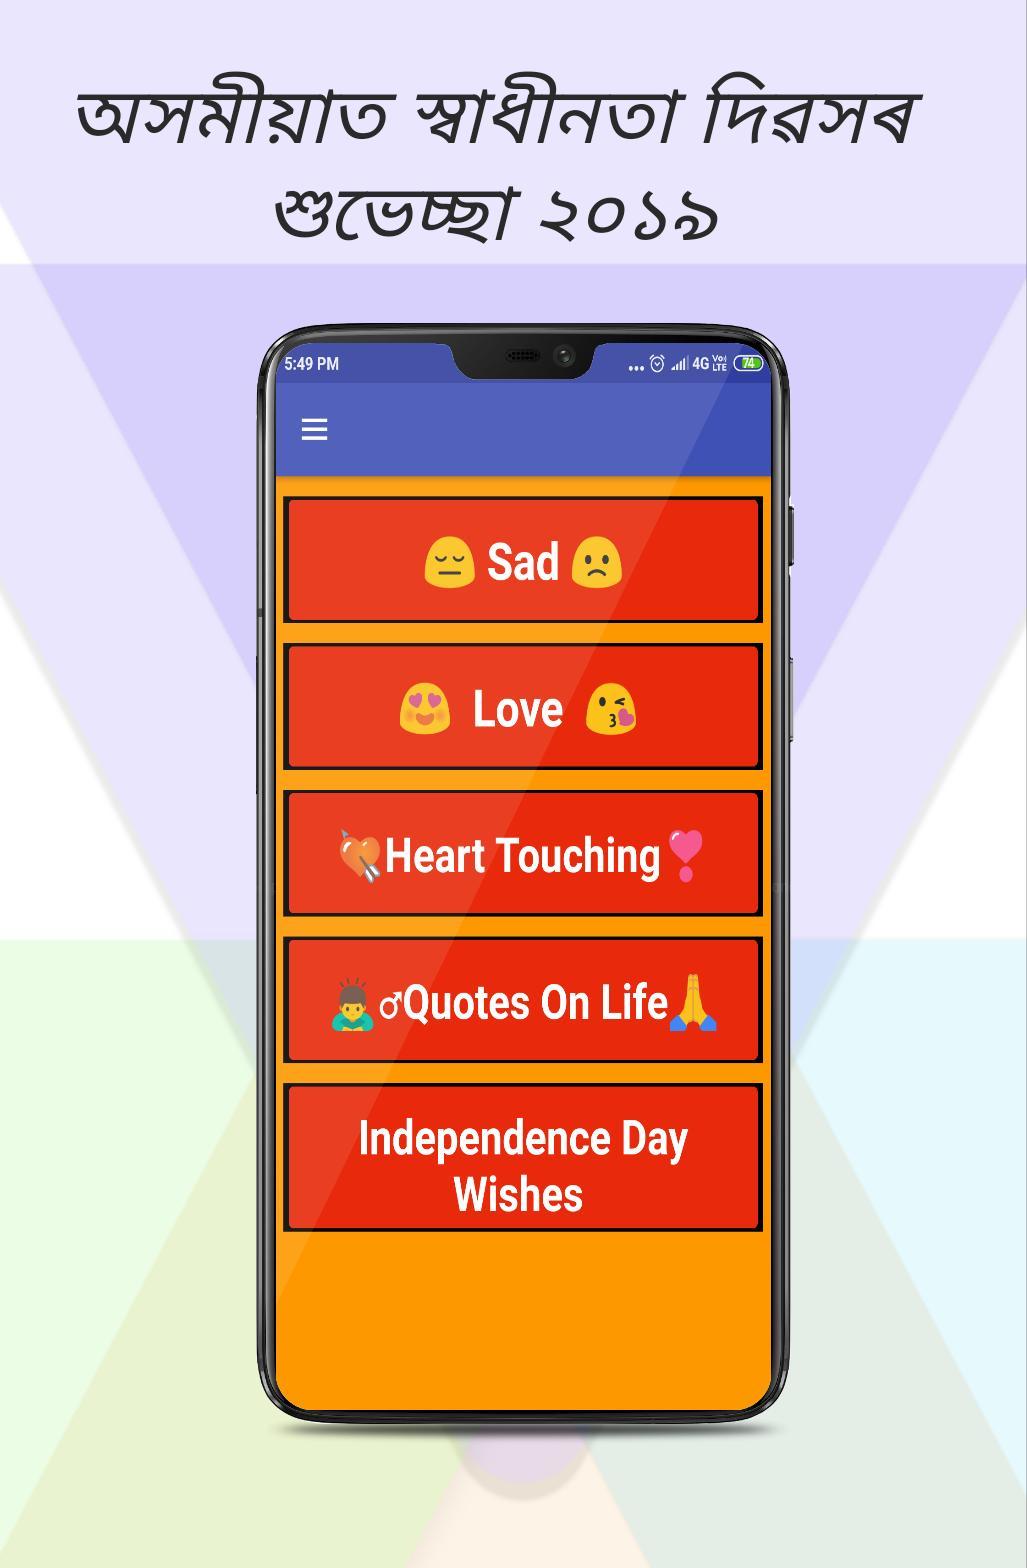 Assamese Love Shayari for Android - APK Download